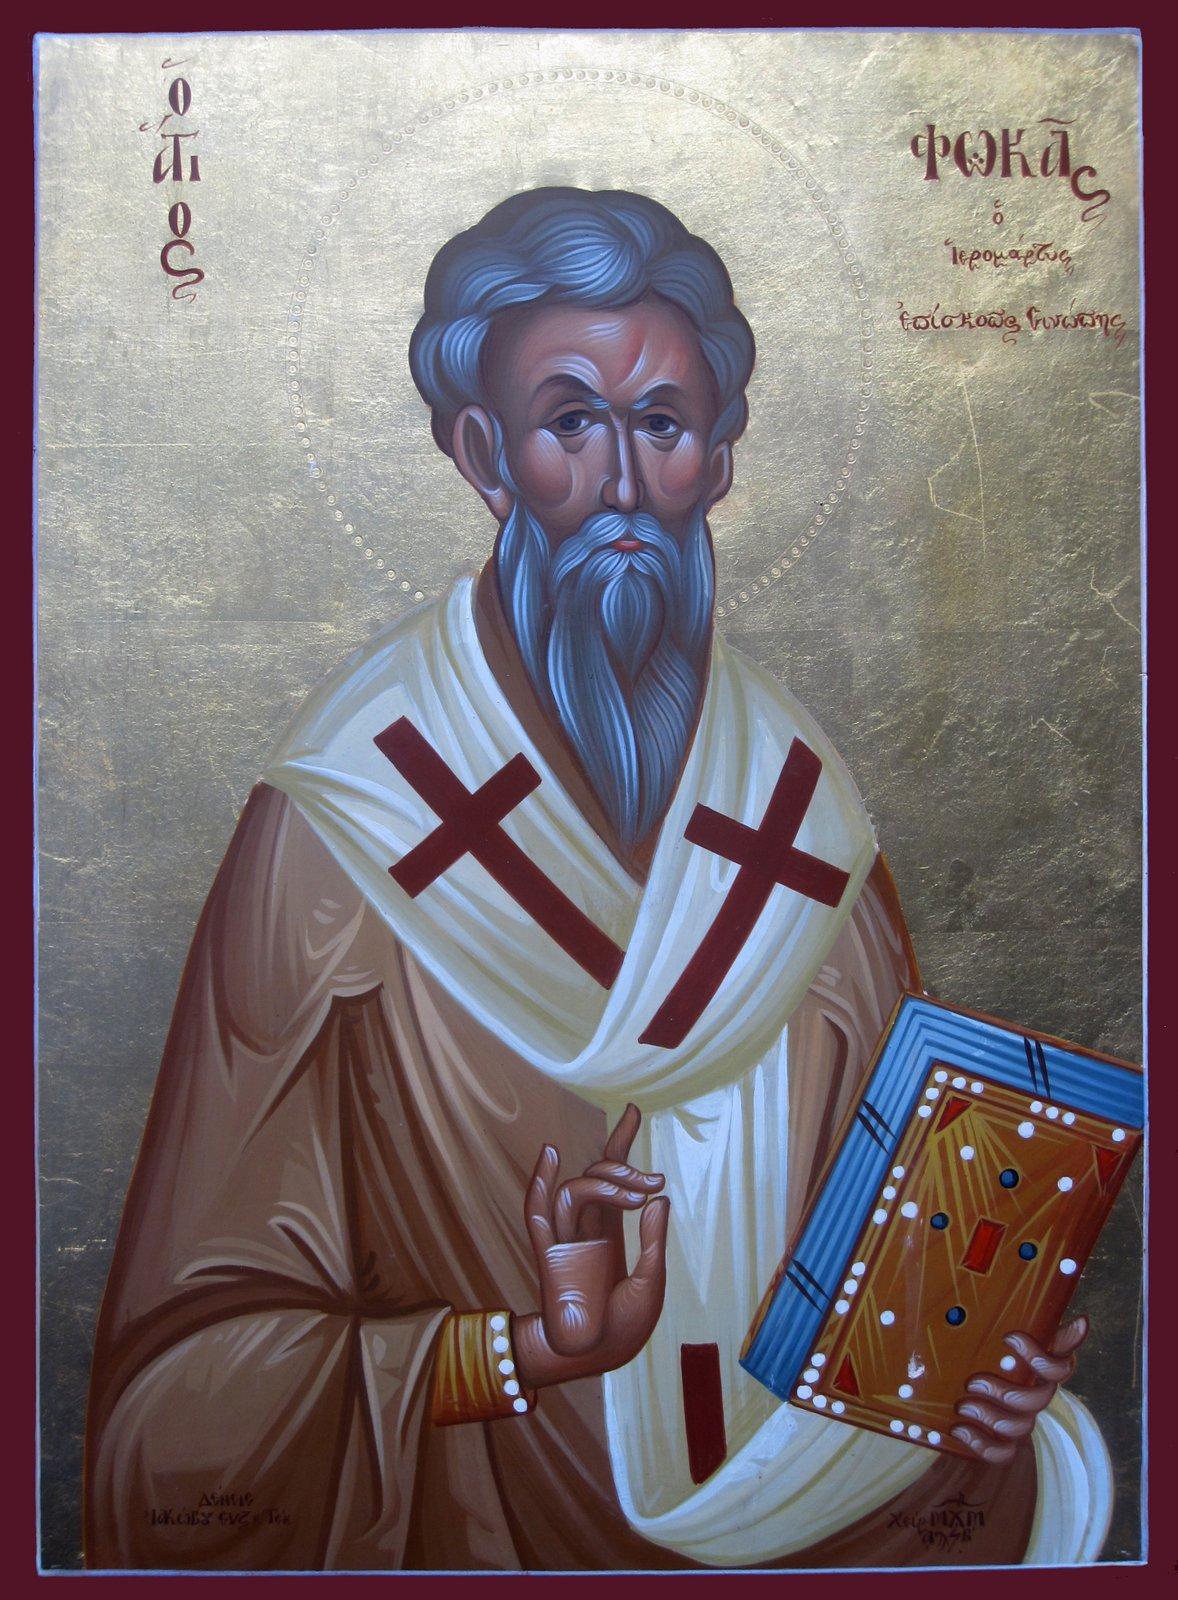 St. Phocas the Hieromartyr